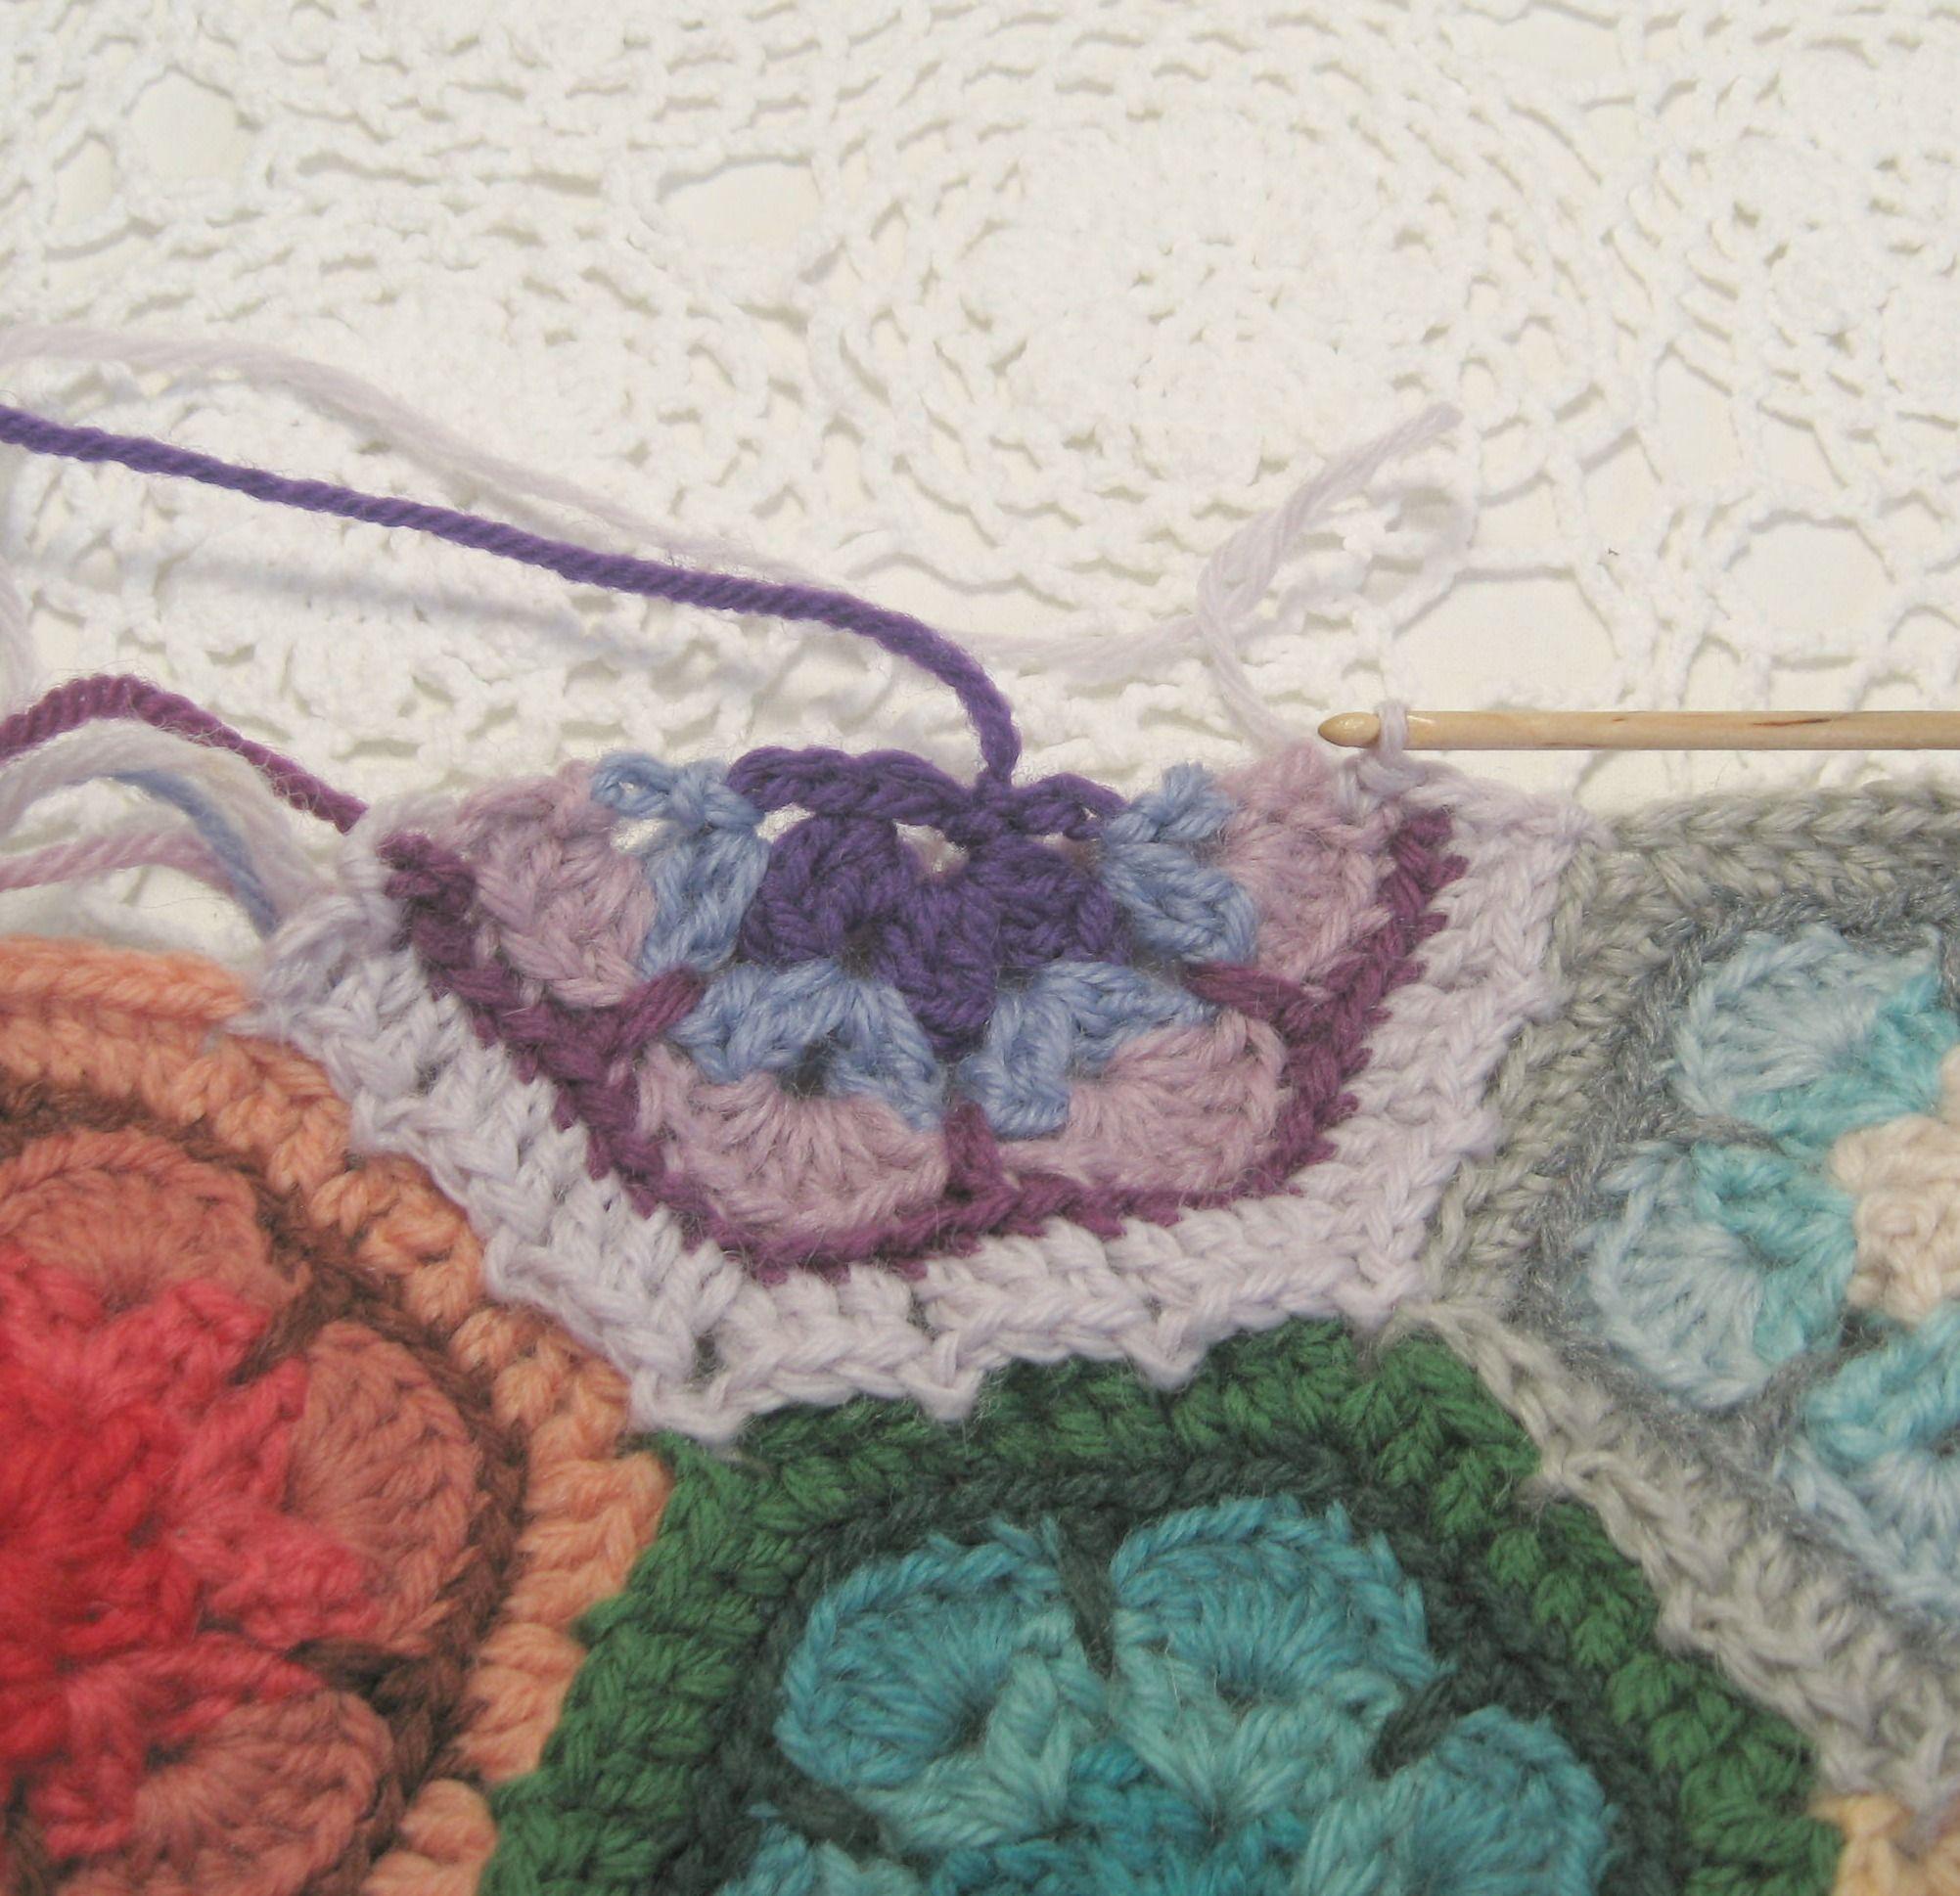 single crochet along the raw edge of the half hexagon ...